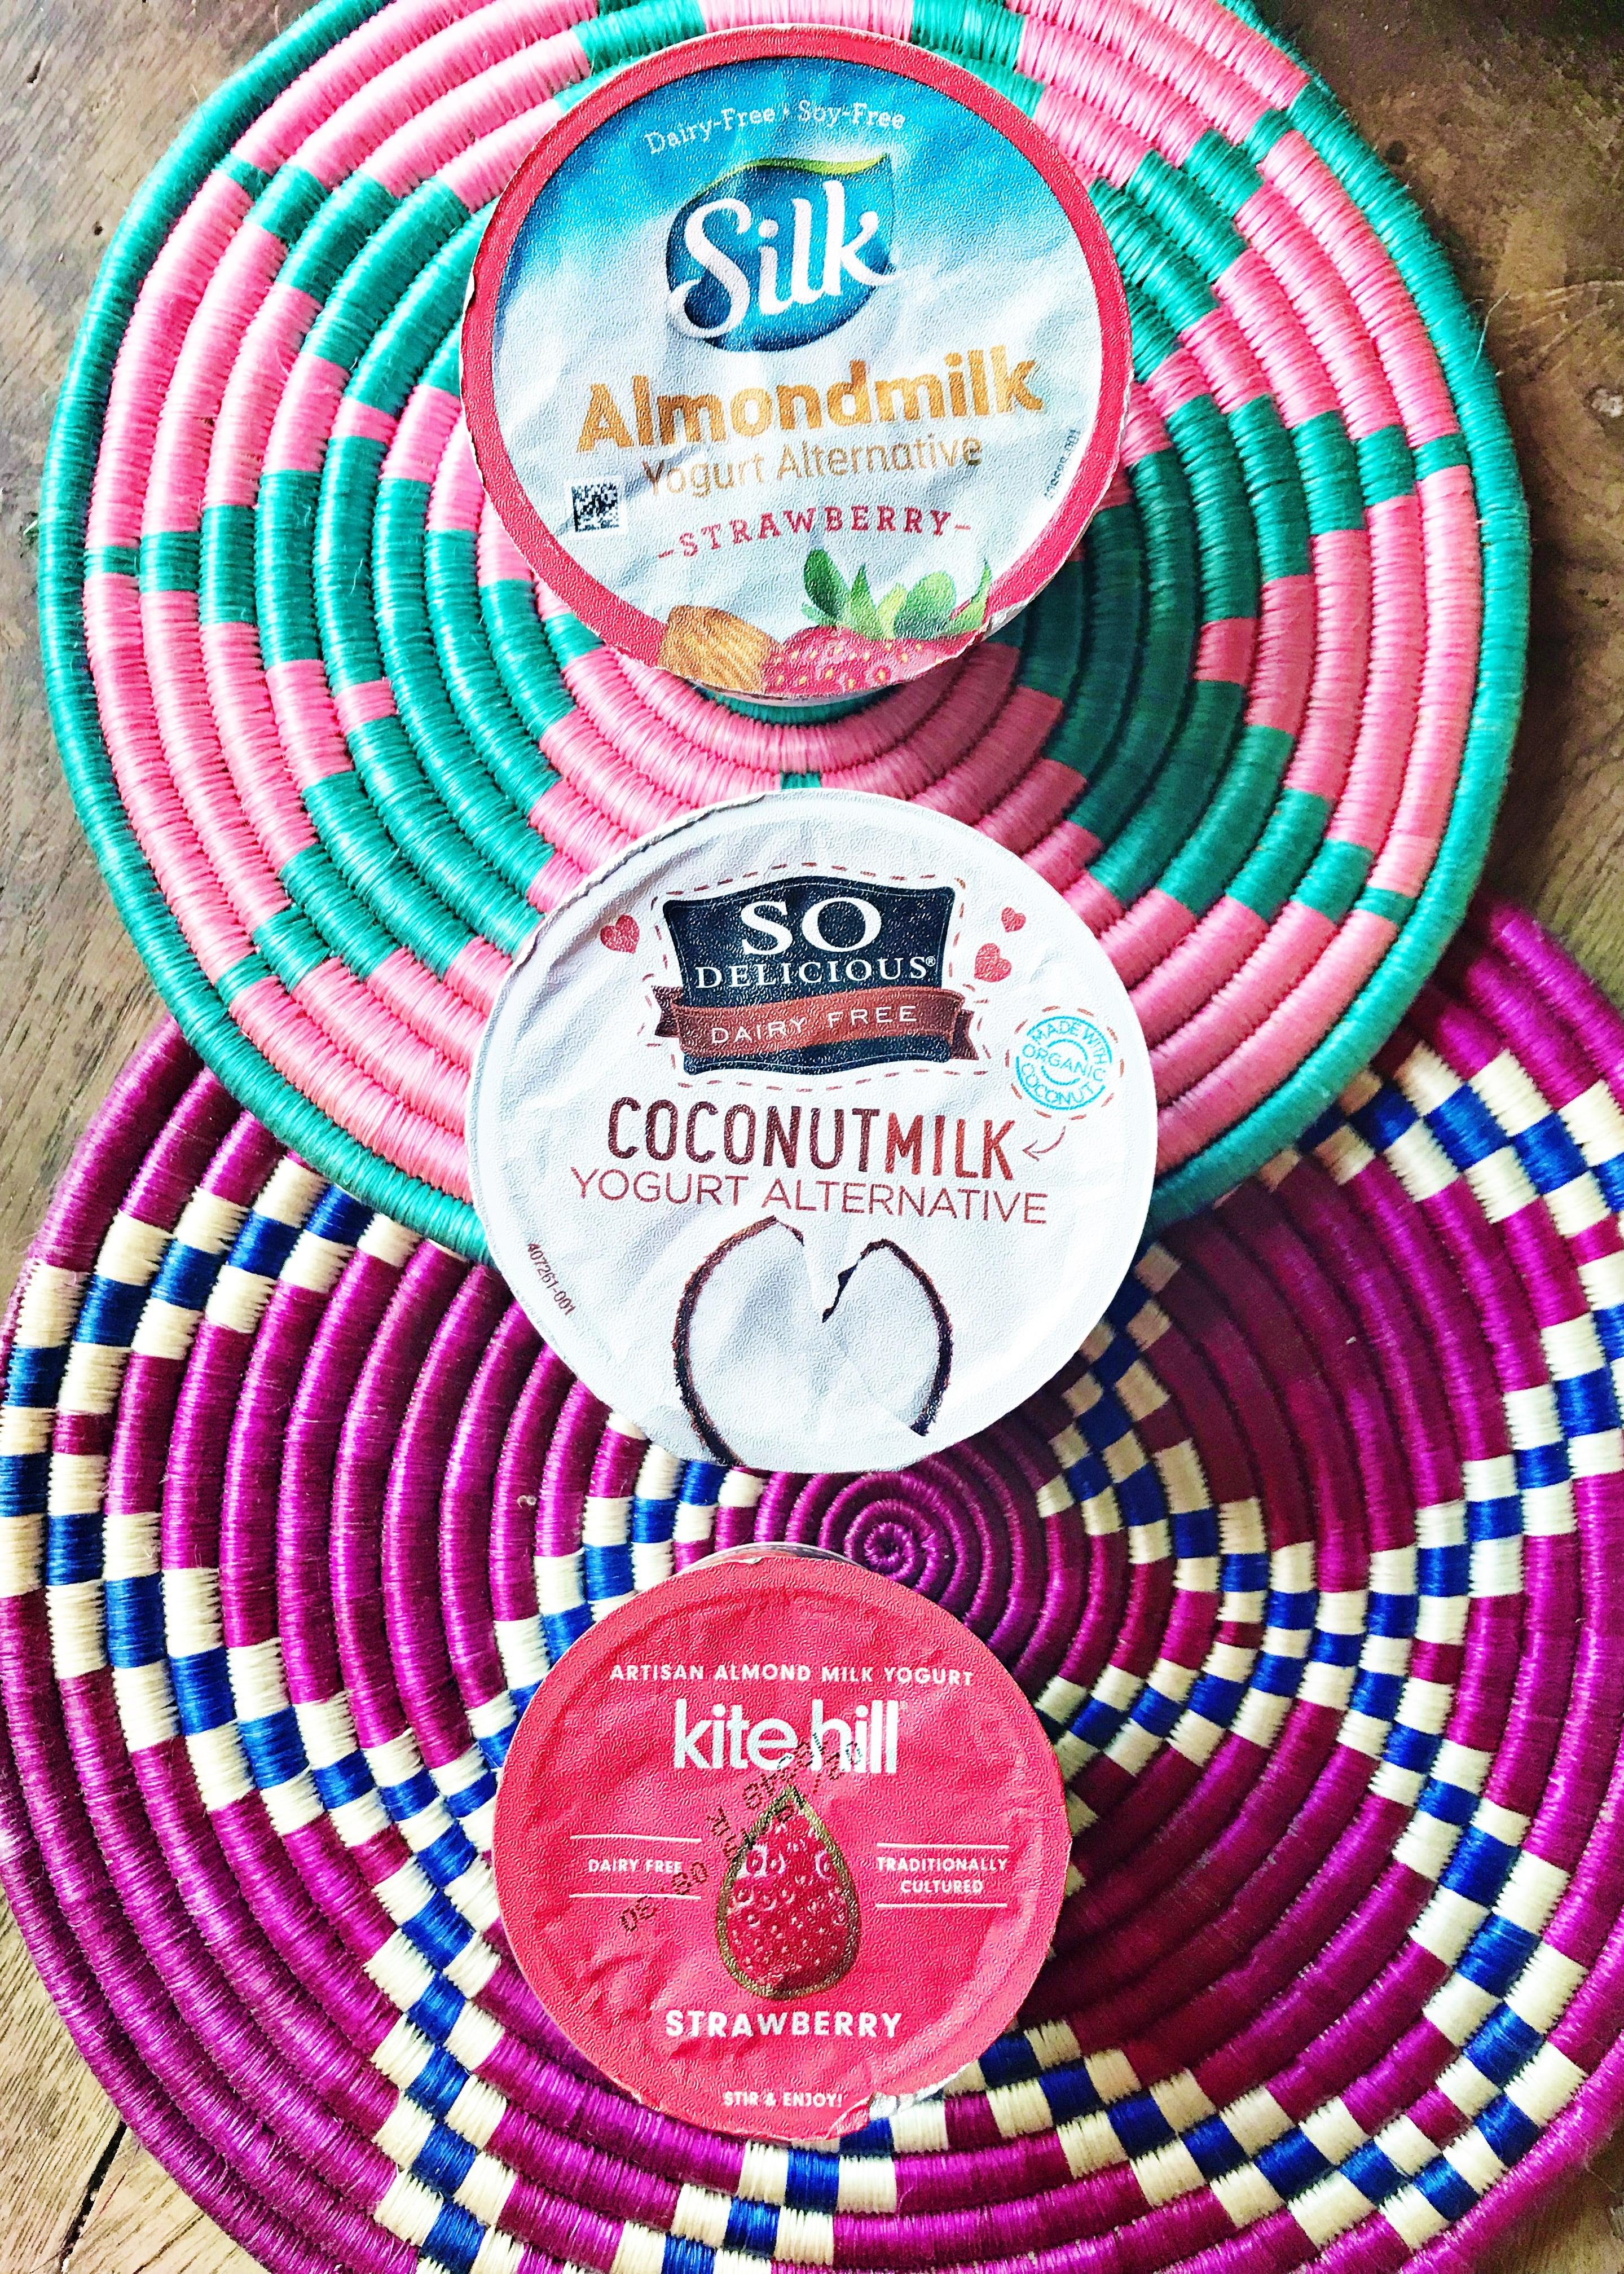 DAIRY FREE YOGURT TASTE TEST | Dairy Free Yogurt - Dairy Free Yogurt Brands - Silk Dairy Free Yogurt - Almondmilk Yogurt - So Delicious Yogurt - Kite Hill Yogurt - Milk Free Yogurt - Where Can I Buy Dairy Free Yogurt - Gluten And Dairy Free Yogurt - Plant Based Yogurt #dairyfree #silk #kitehill #sodelicious